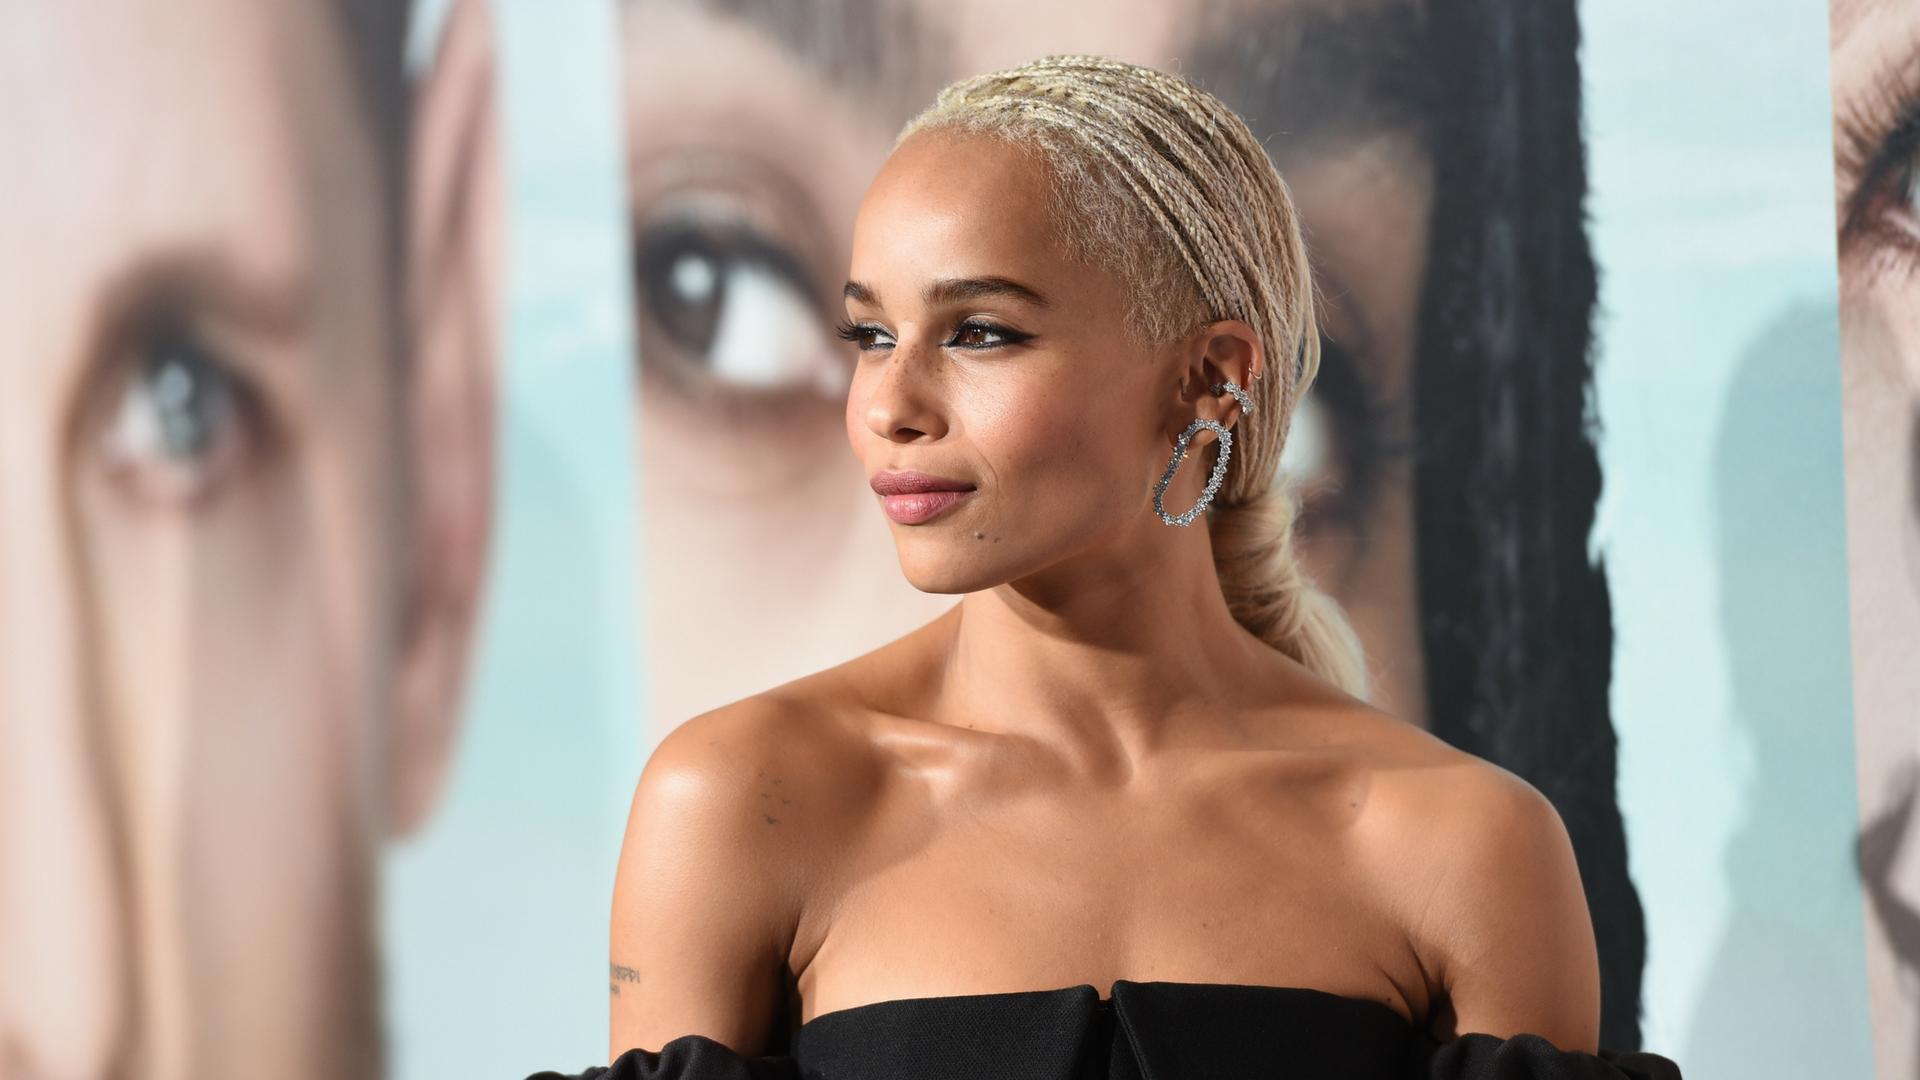 Zoë Kravitz Is Named The Global Face Of YSL Beauty